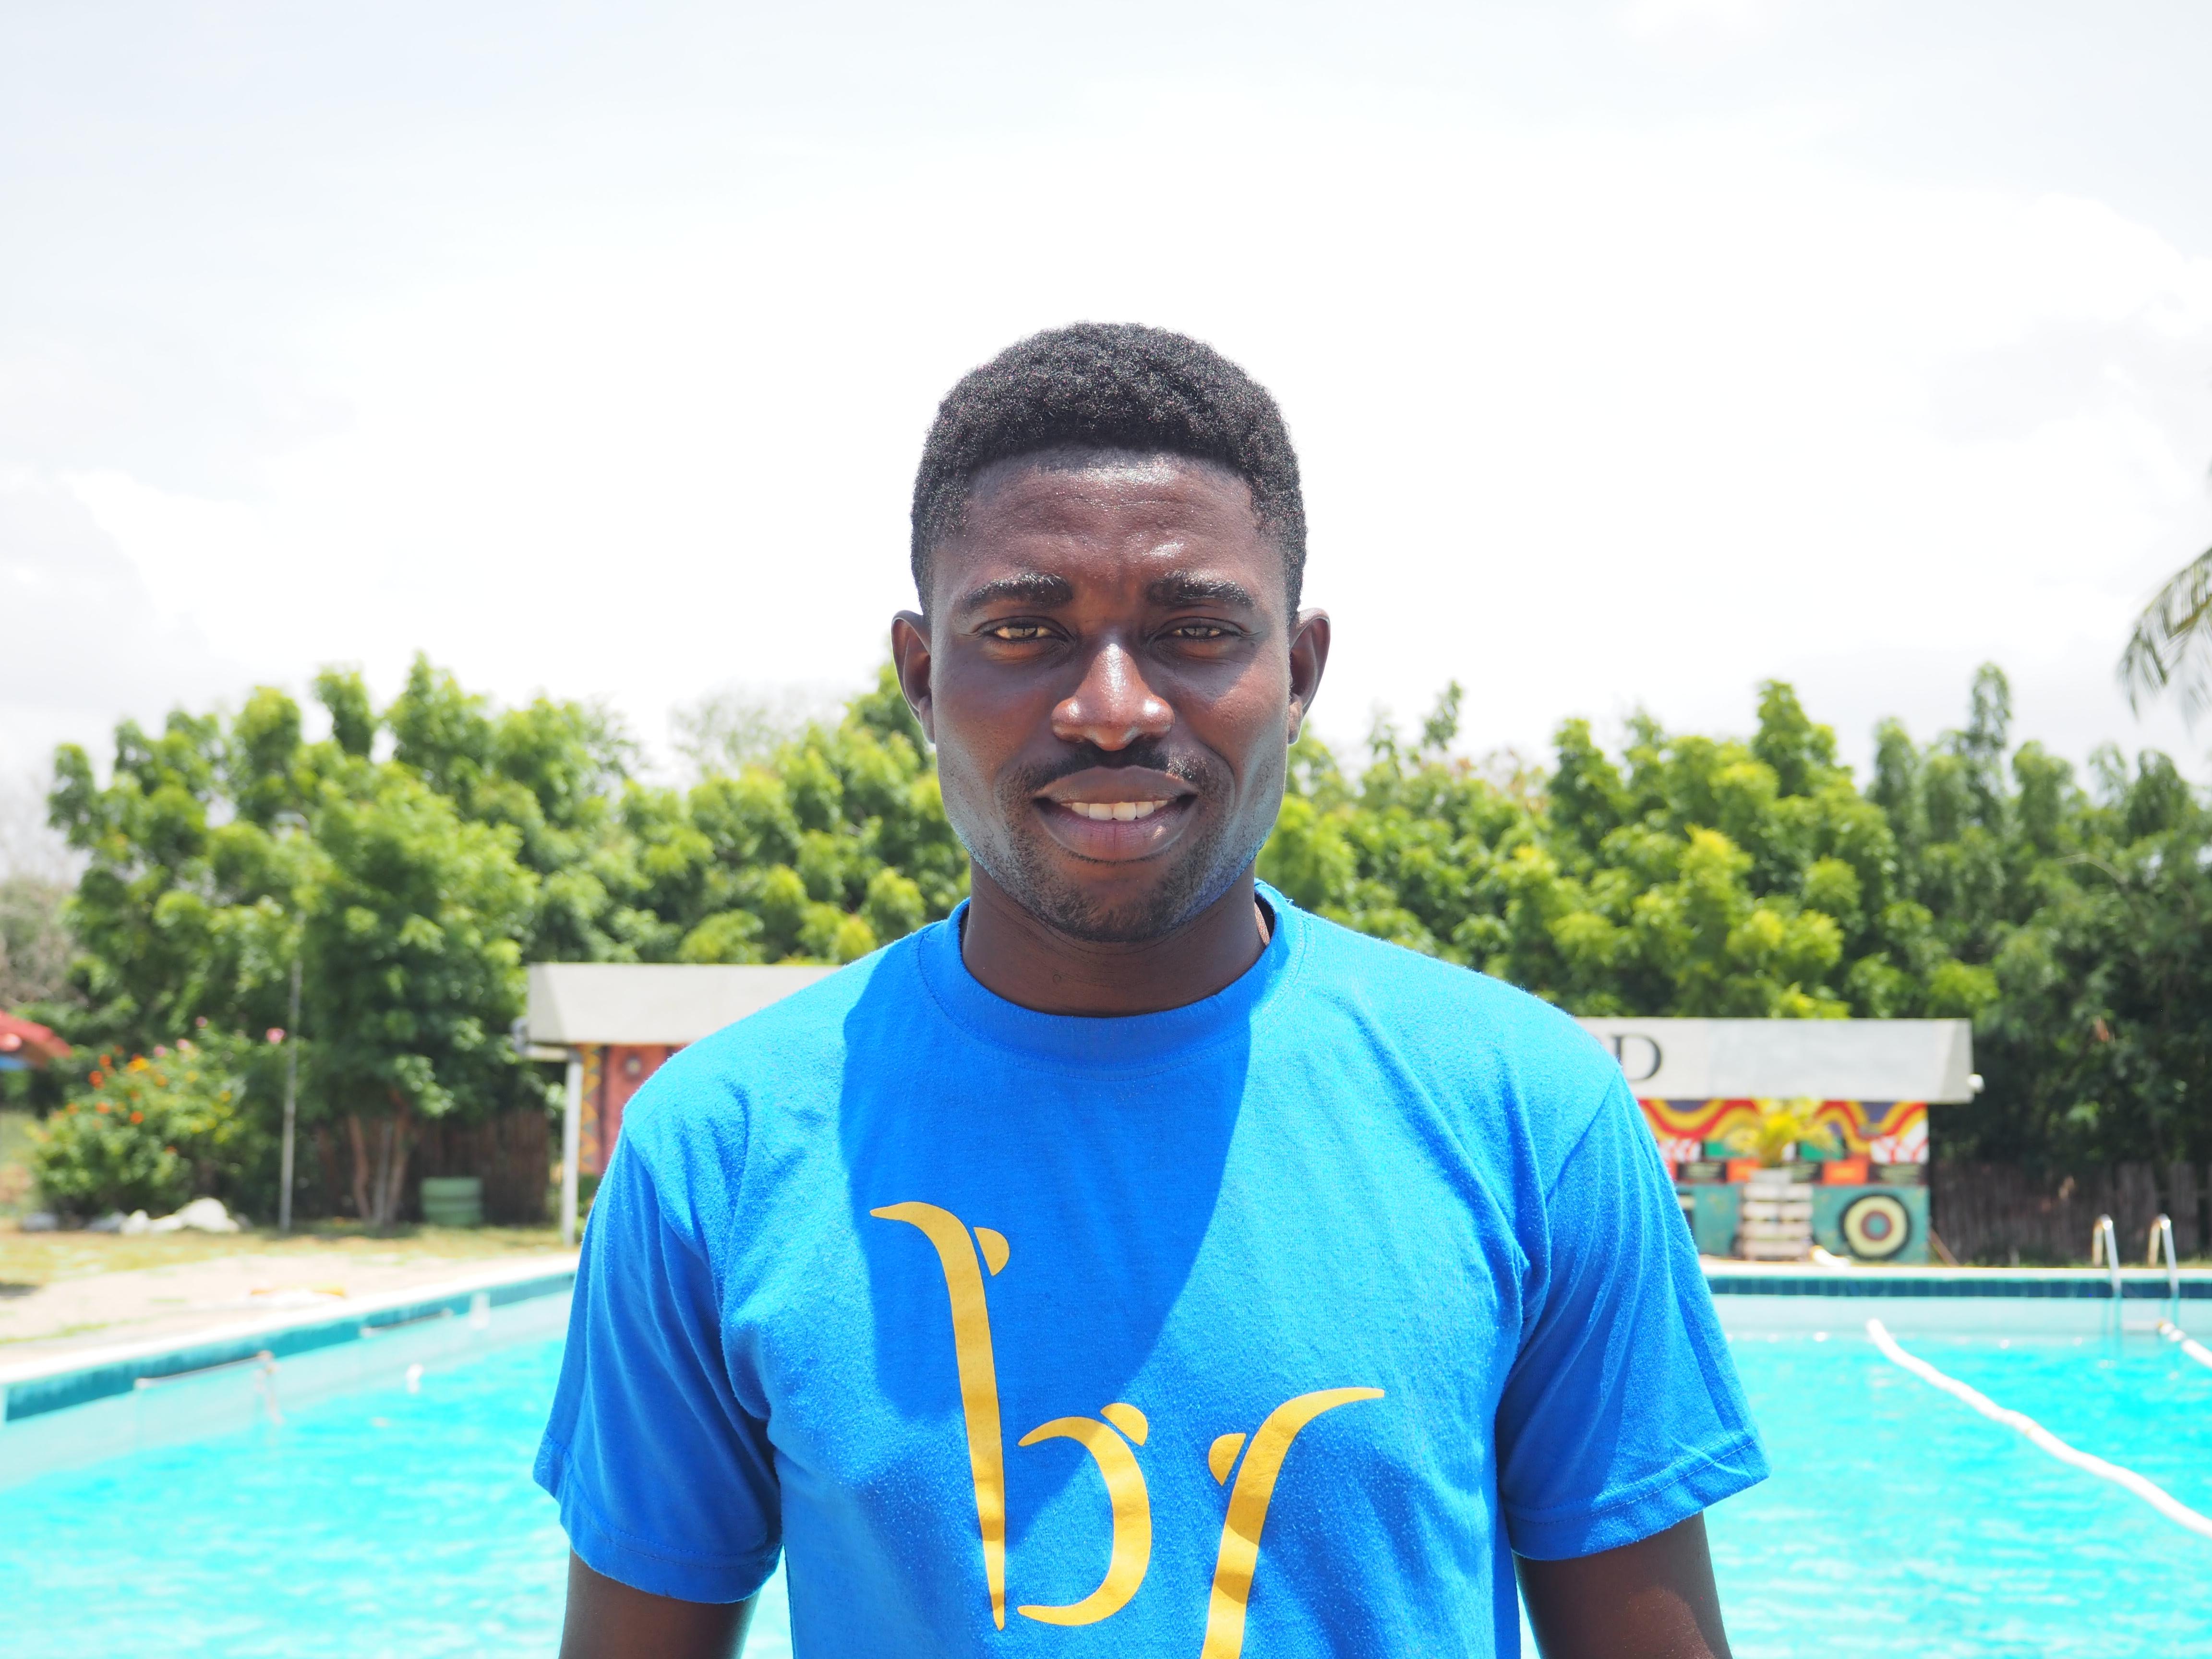 Desmond Amponsah